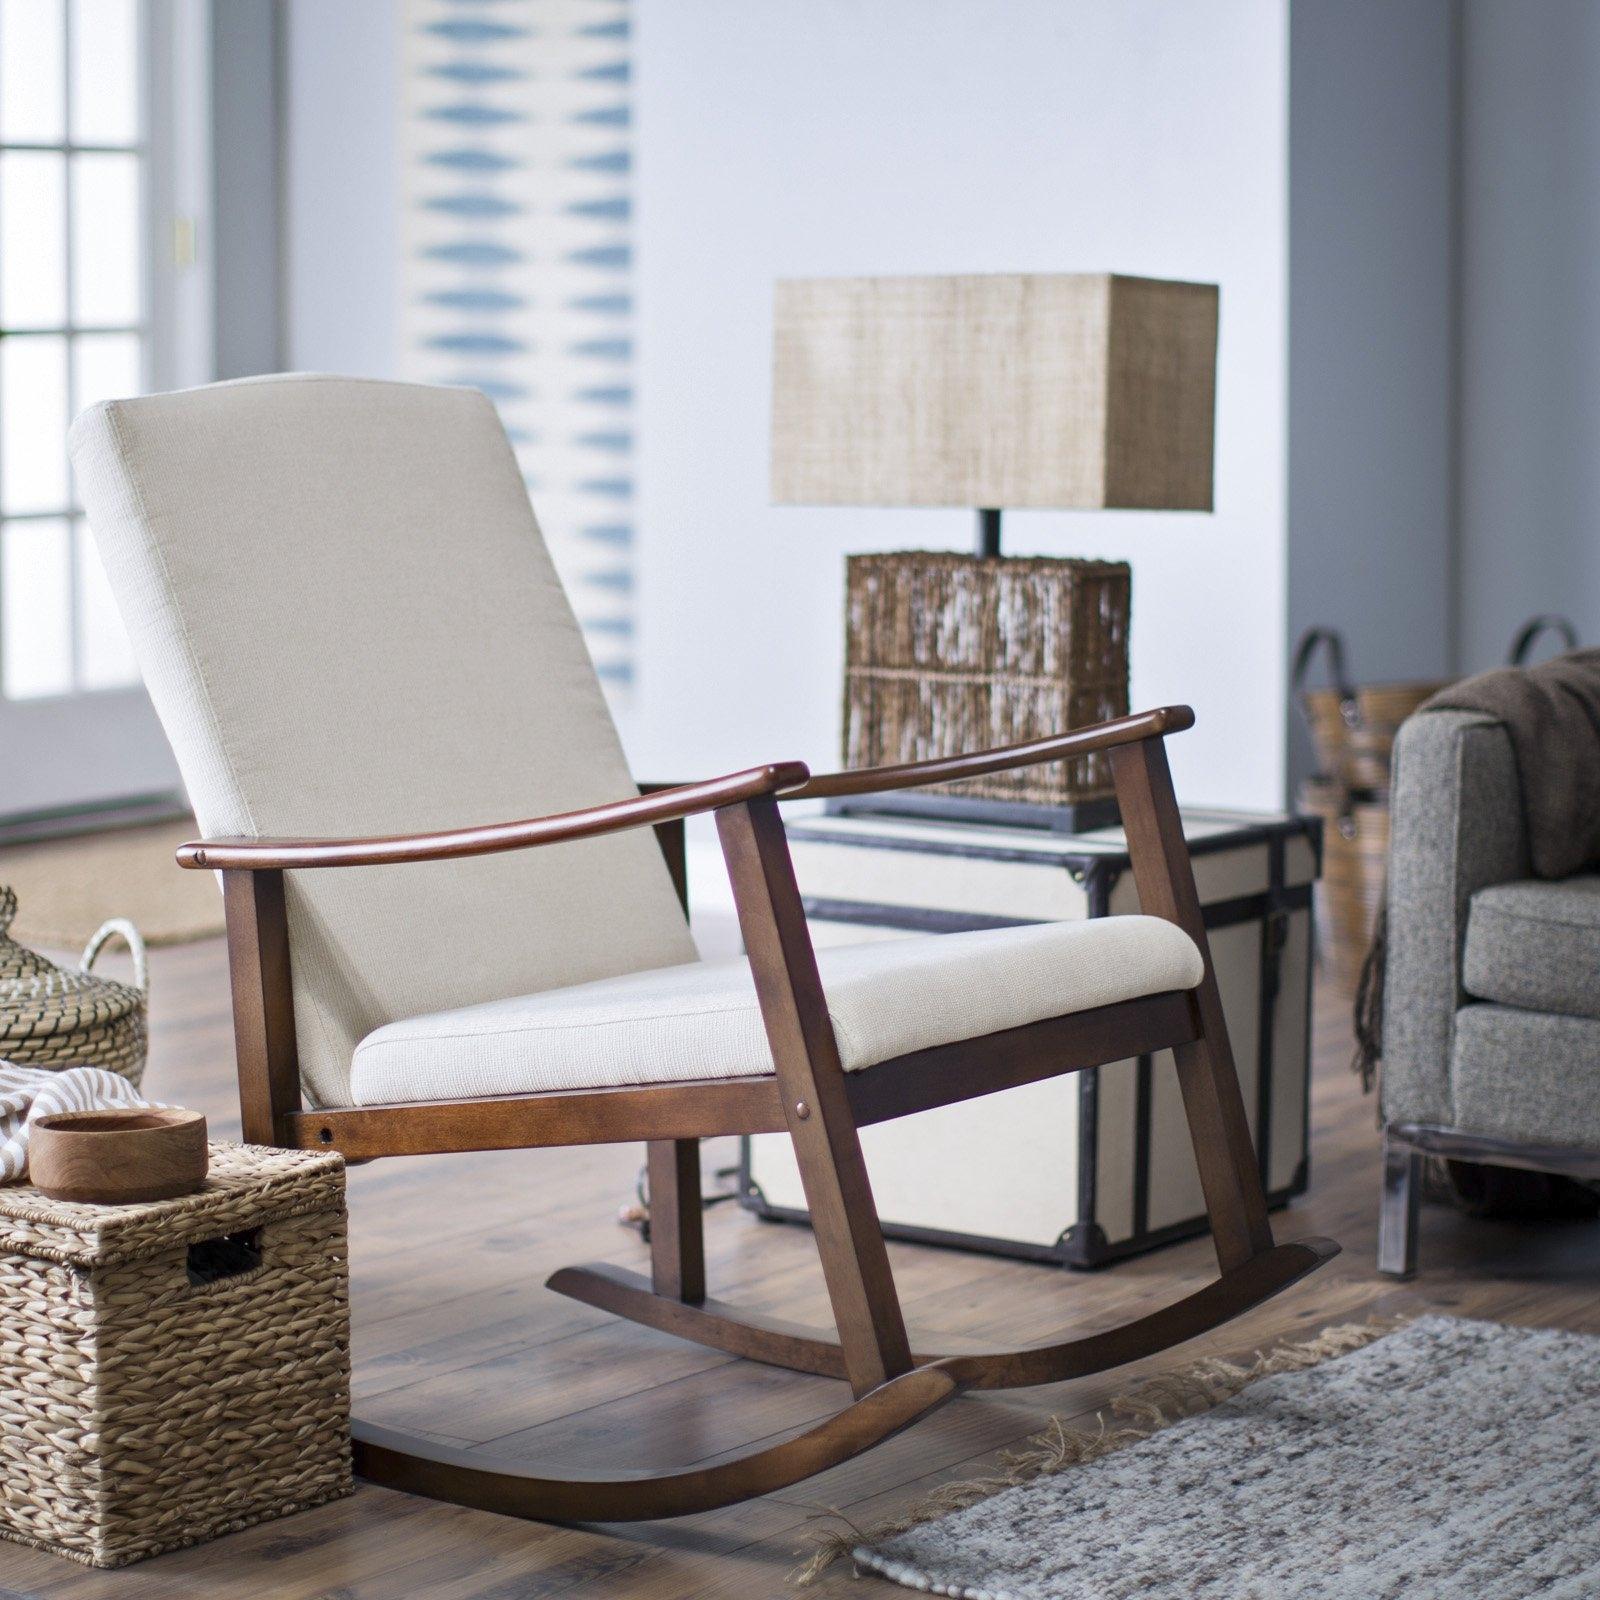 Best Upholstered Rocking Chair For Nursery Editeestrela Design With  Wonderful White Rocking Chair For Nursery Wonderful